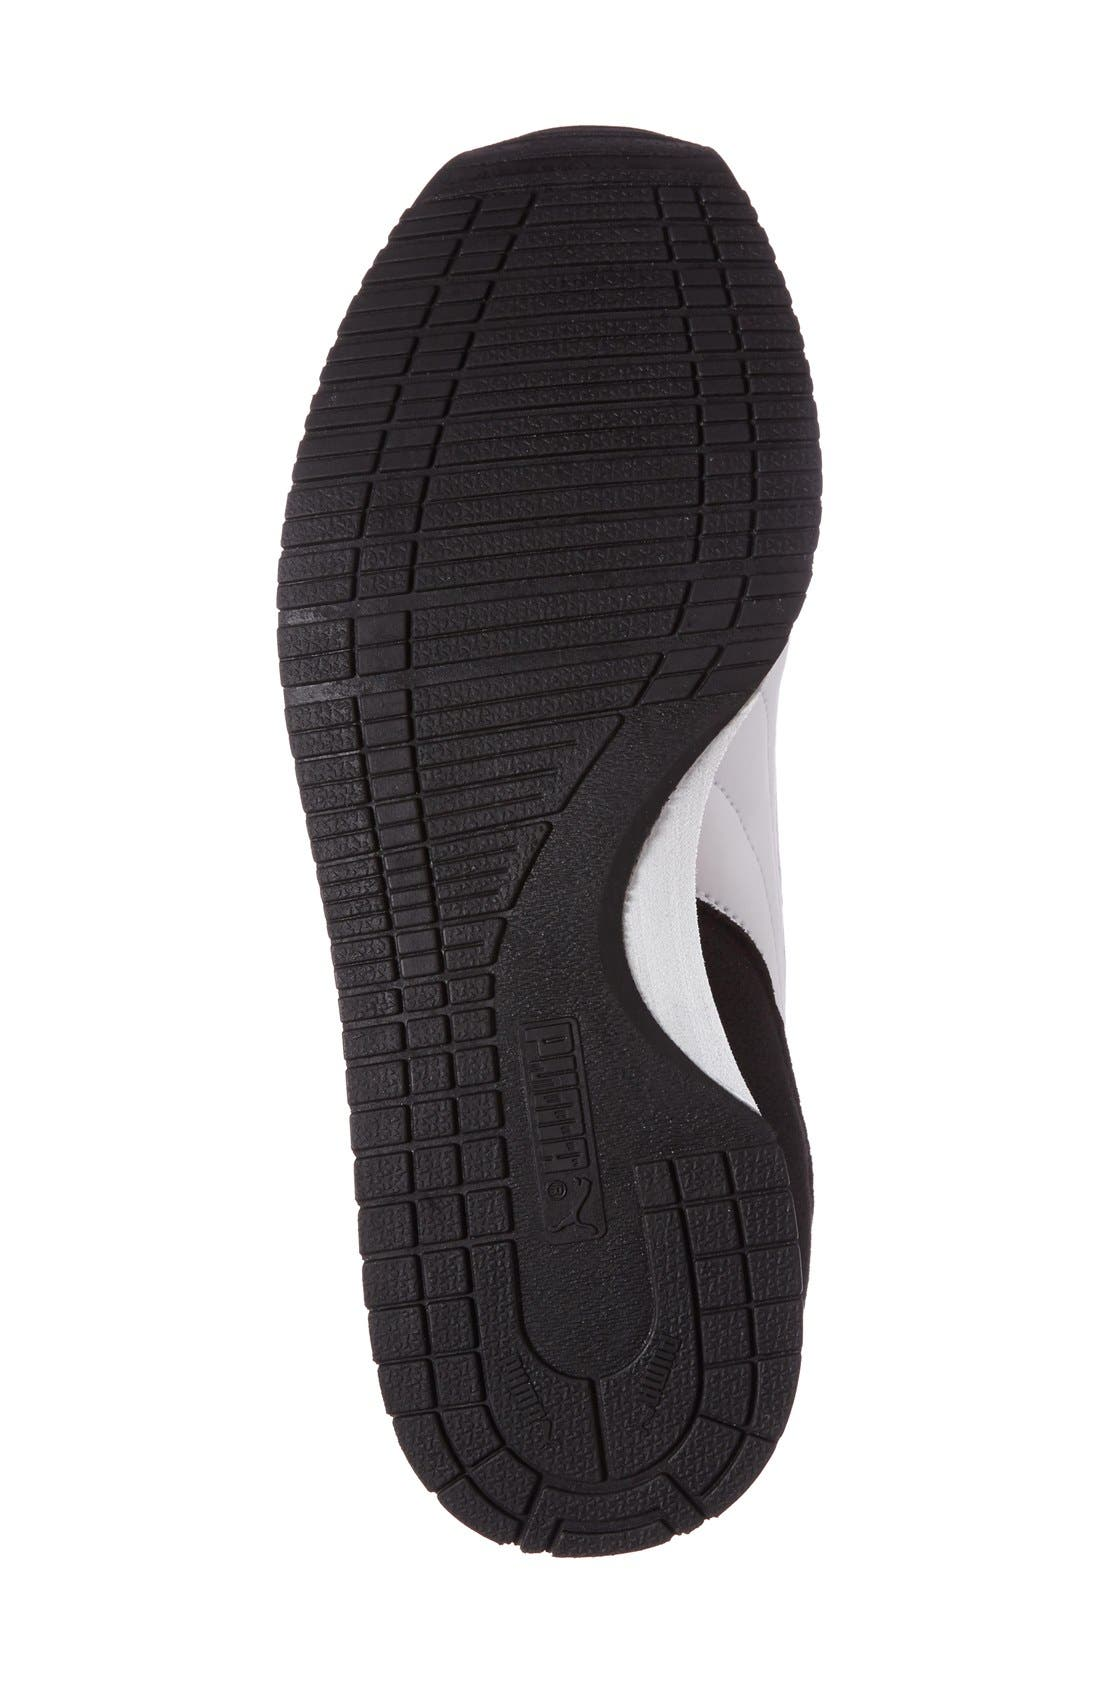 Cabana Racer Sneaker,                             Alternate thumbnail 4, color,                             Puma Black-Puma White